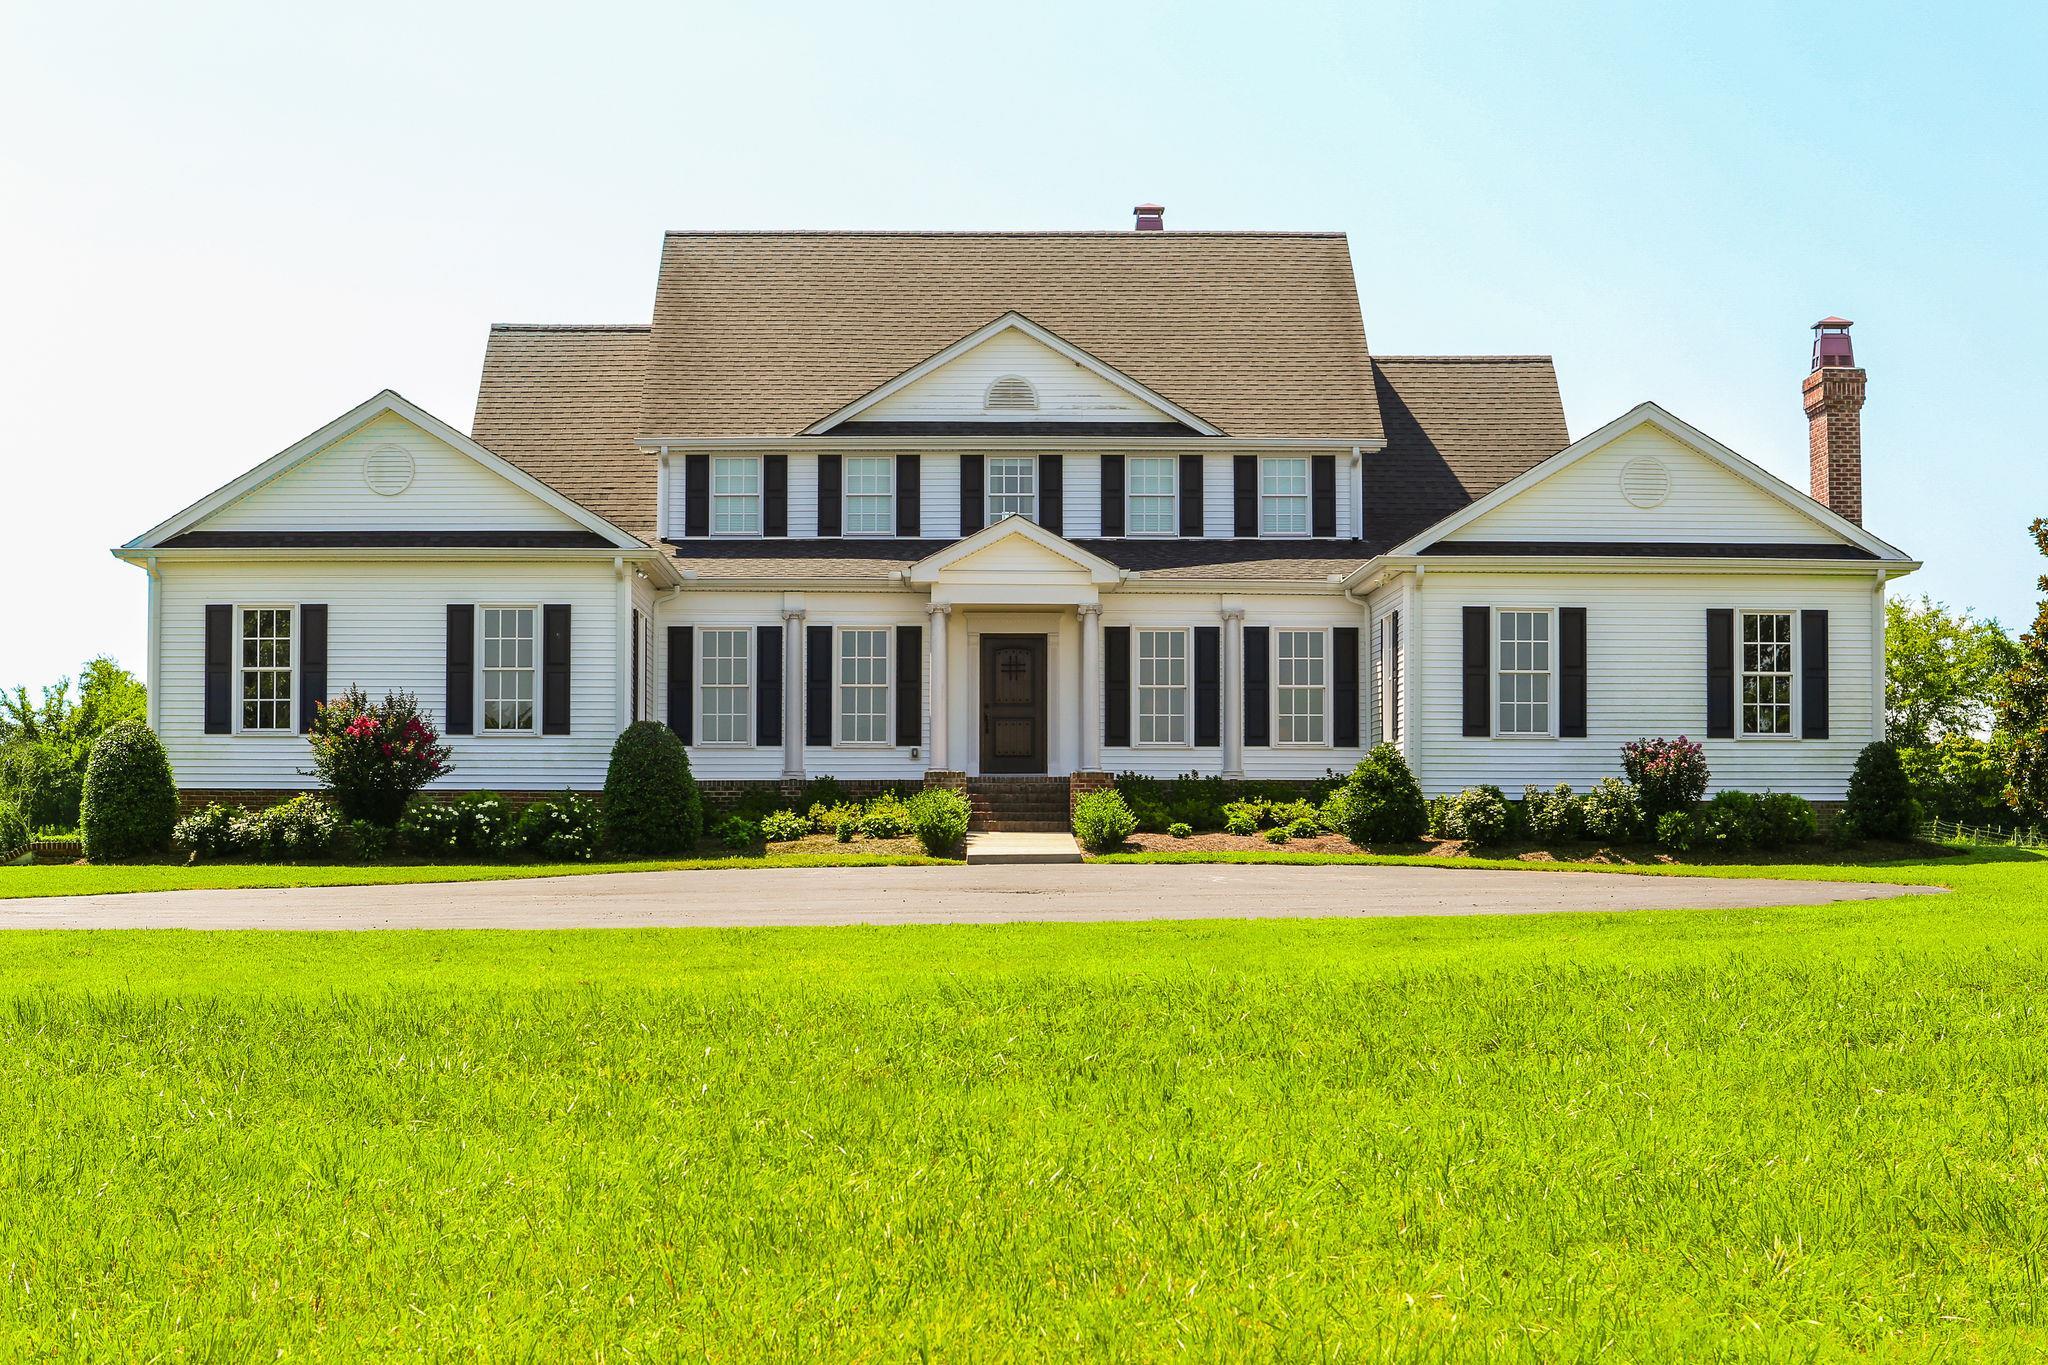 2552 Old Rome Pike, Lebanon, TN 37087 - Lebanon, TN real estate listing